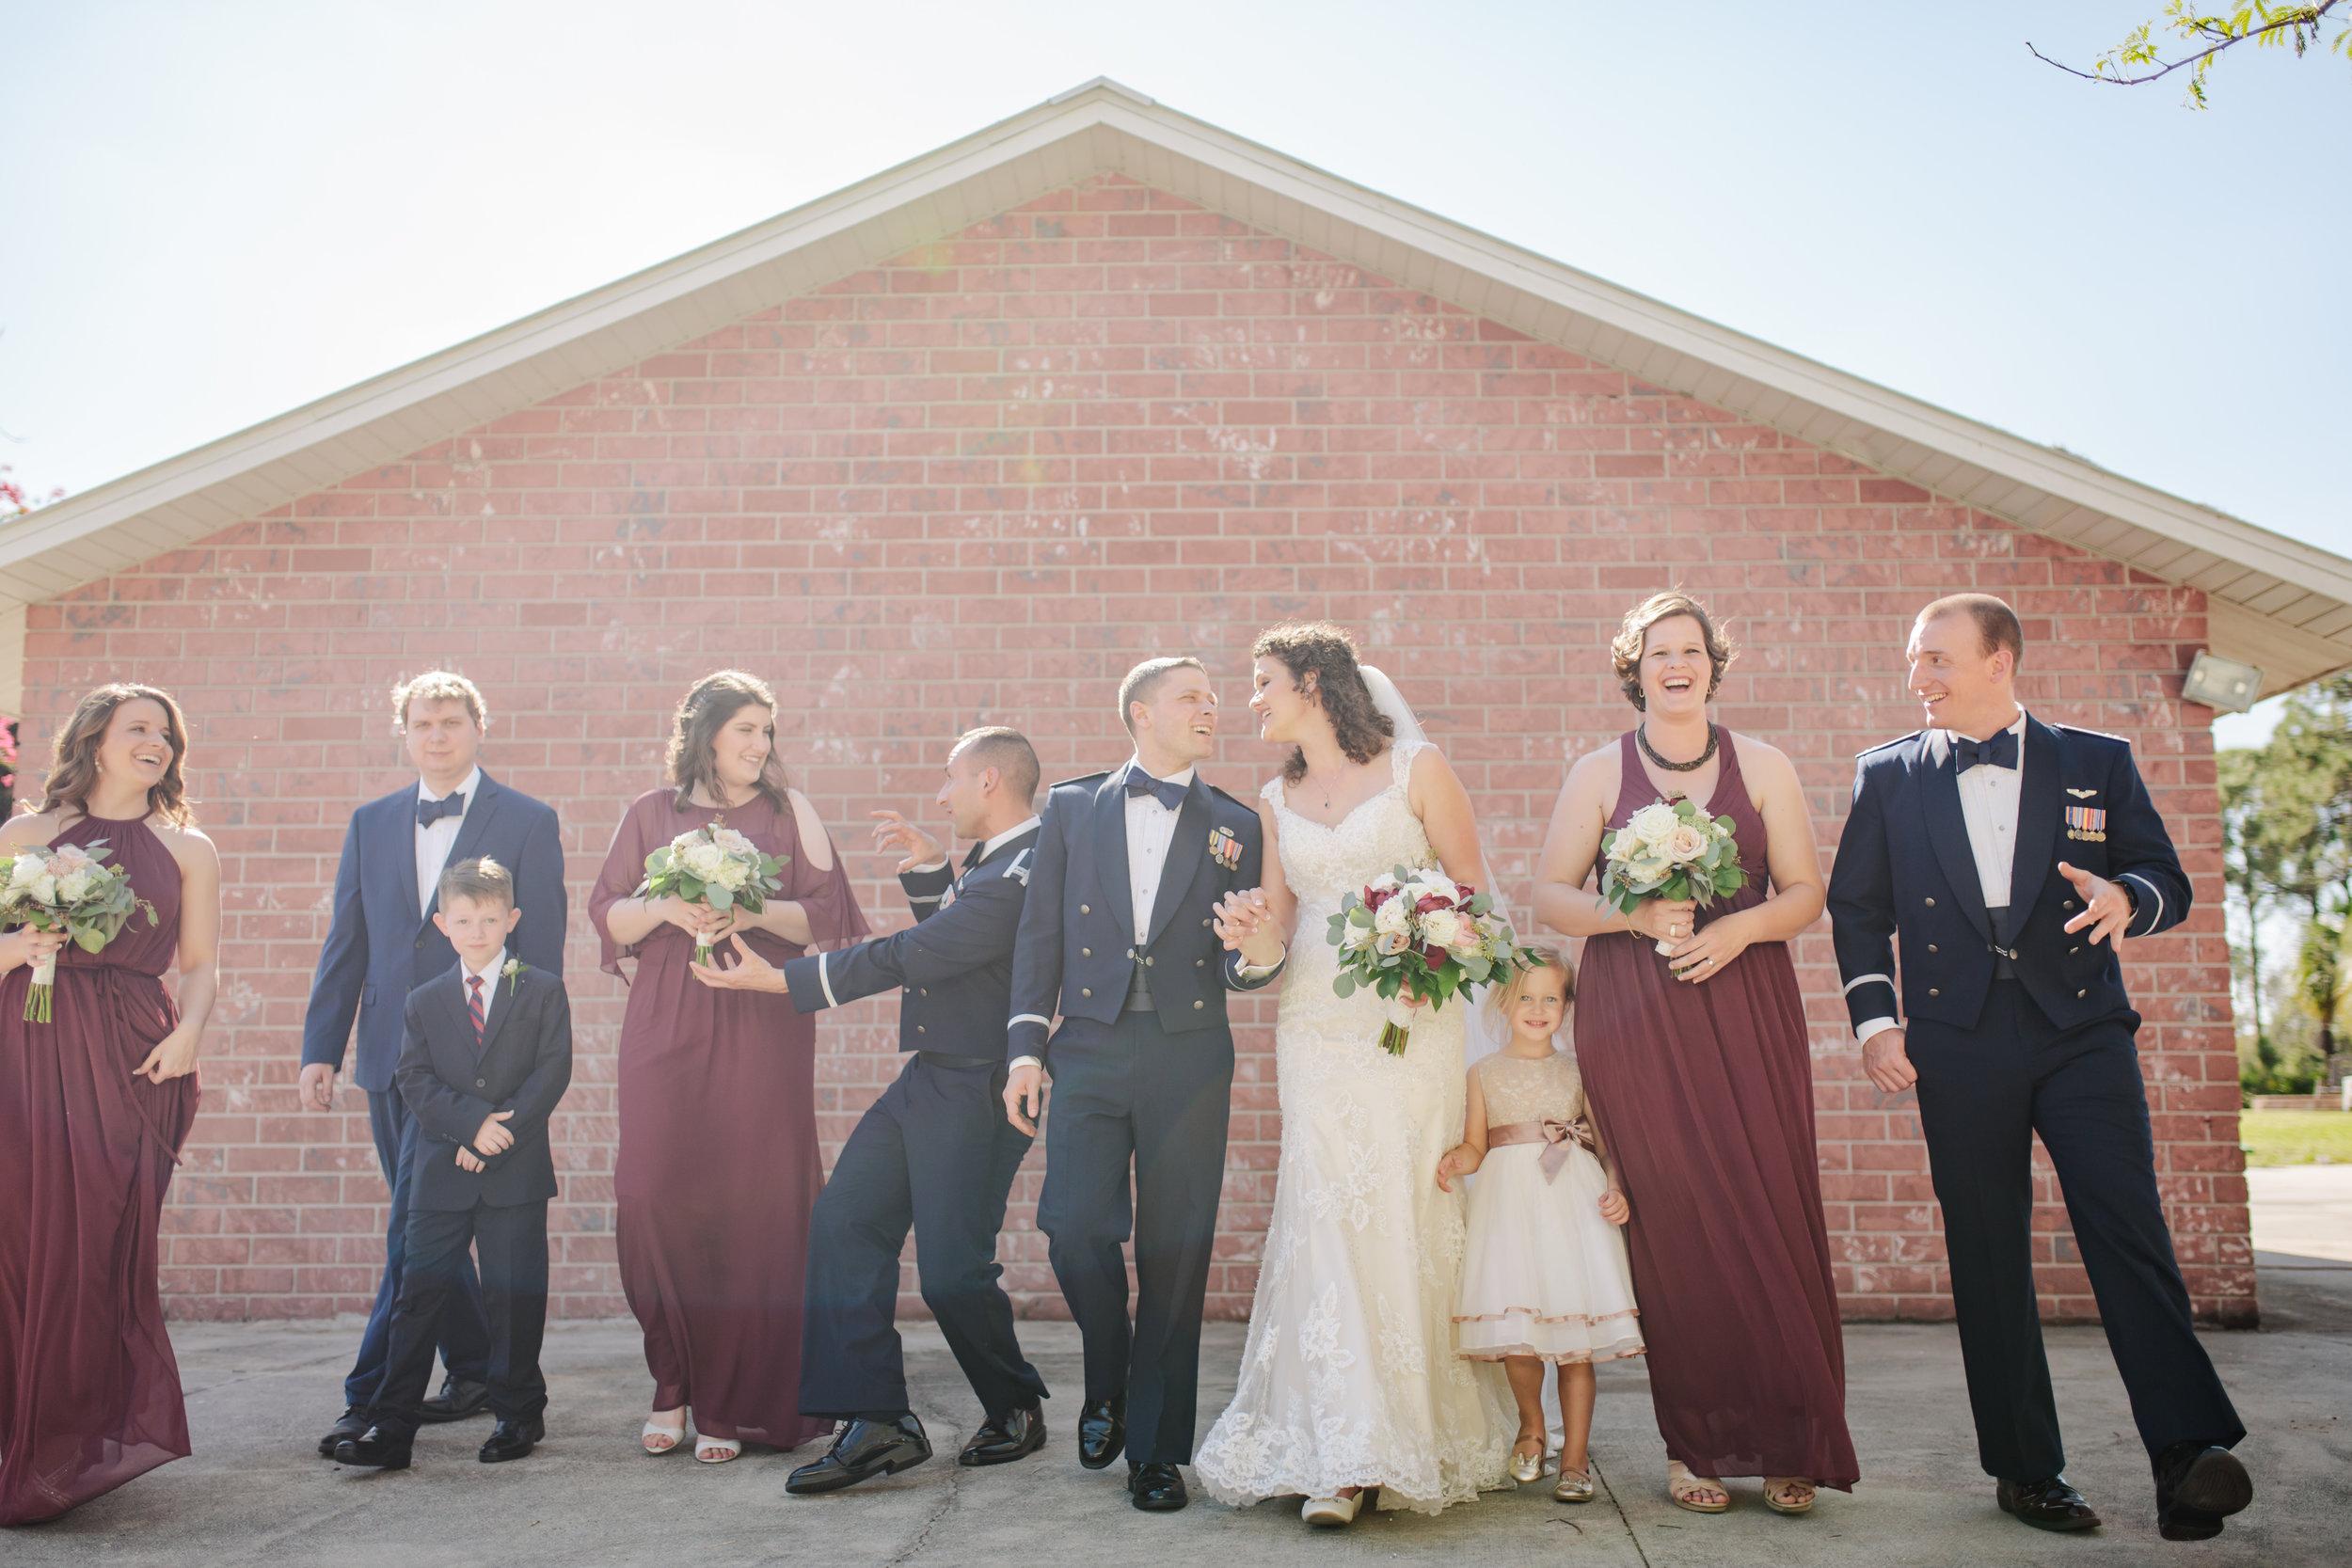 2018.03.17 Allison and Chuck Wedding Waelti Melbourne (448 of 569).jpg